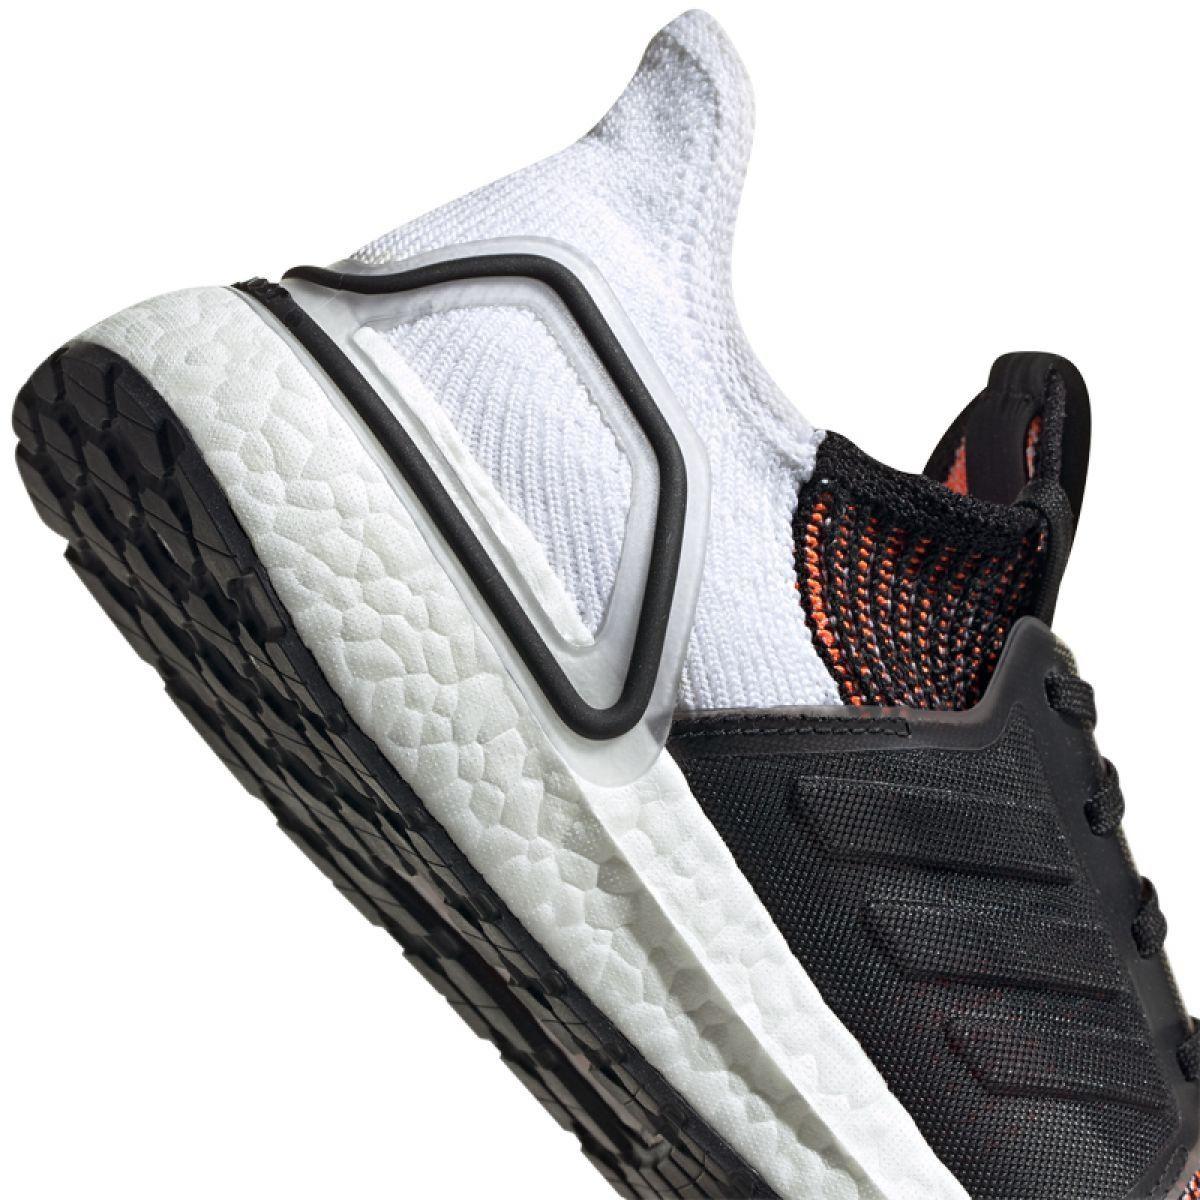 Treningowe Bieganie Sport Innamarka Wielokolorowe Buty Biegowe Adidas Ultraboost 19 M M Black Running Shoes Adidas Ultra Boost Adidas Running Shoes